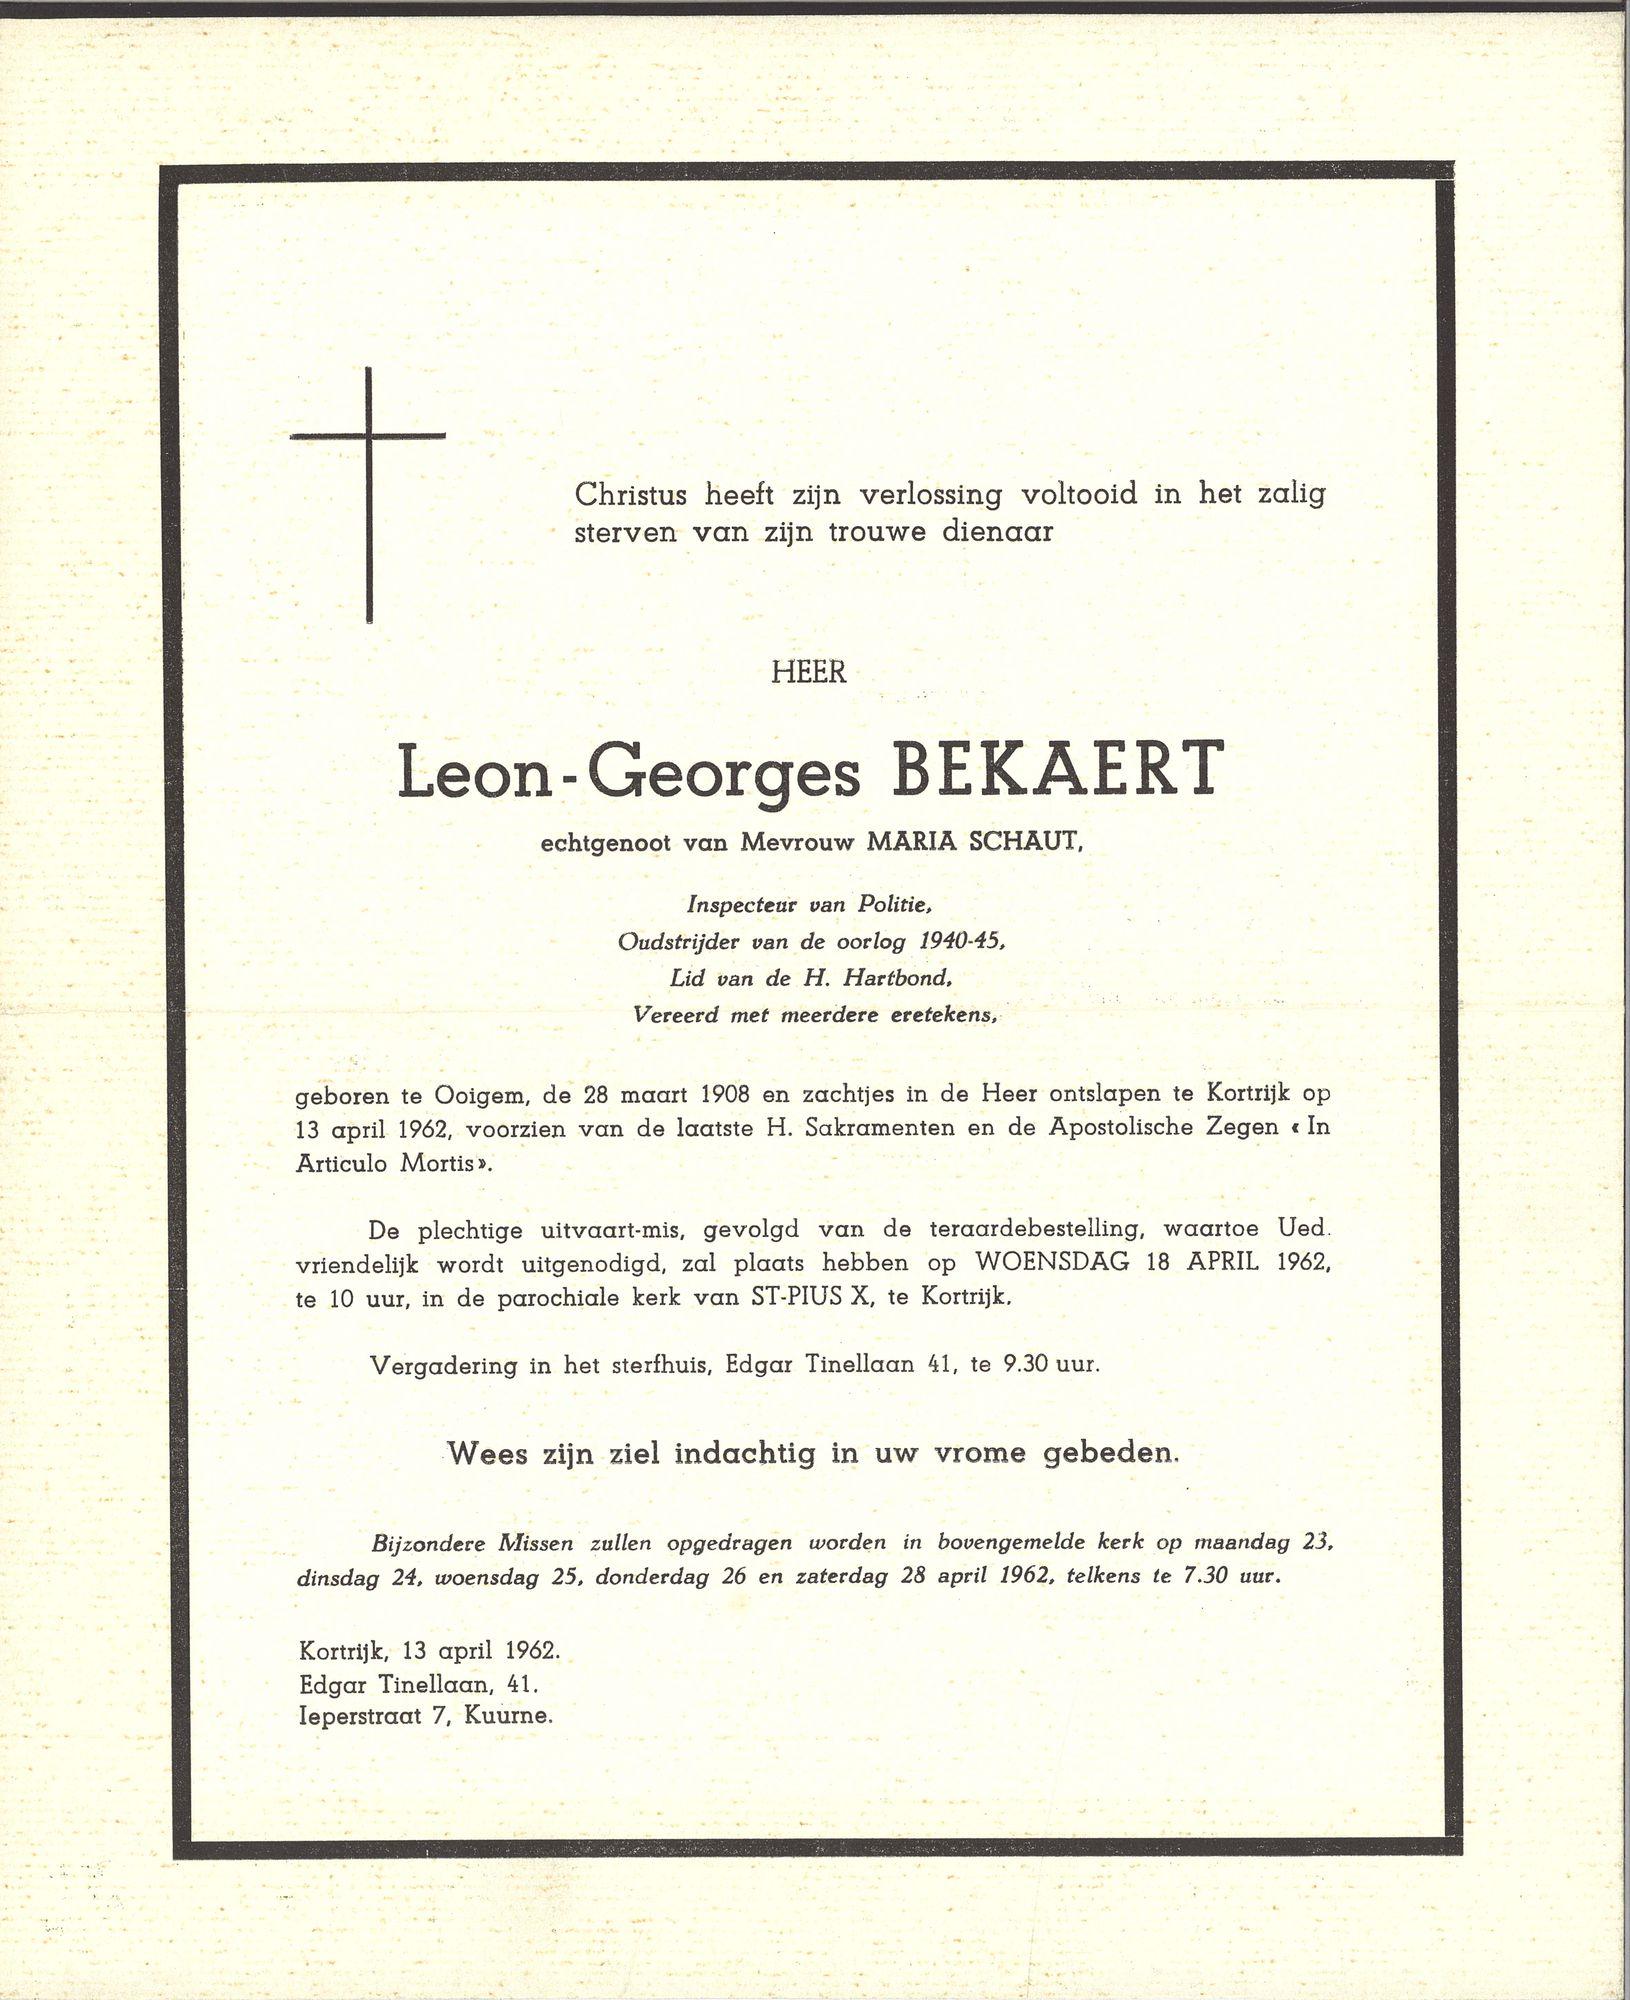 Leon-Georges Bekaert